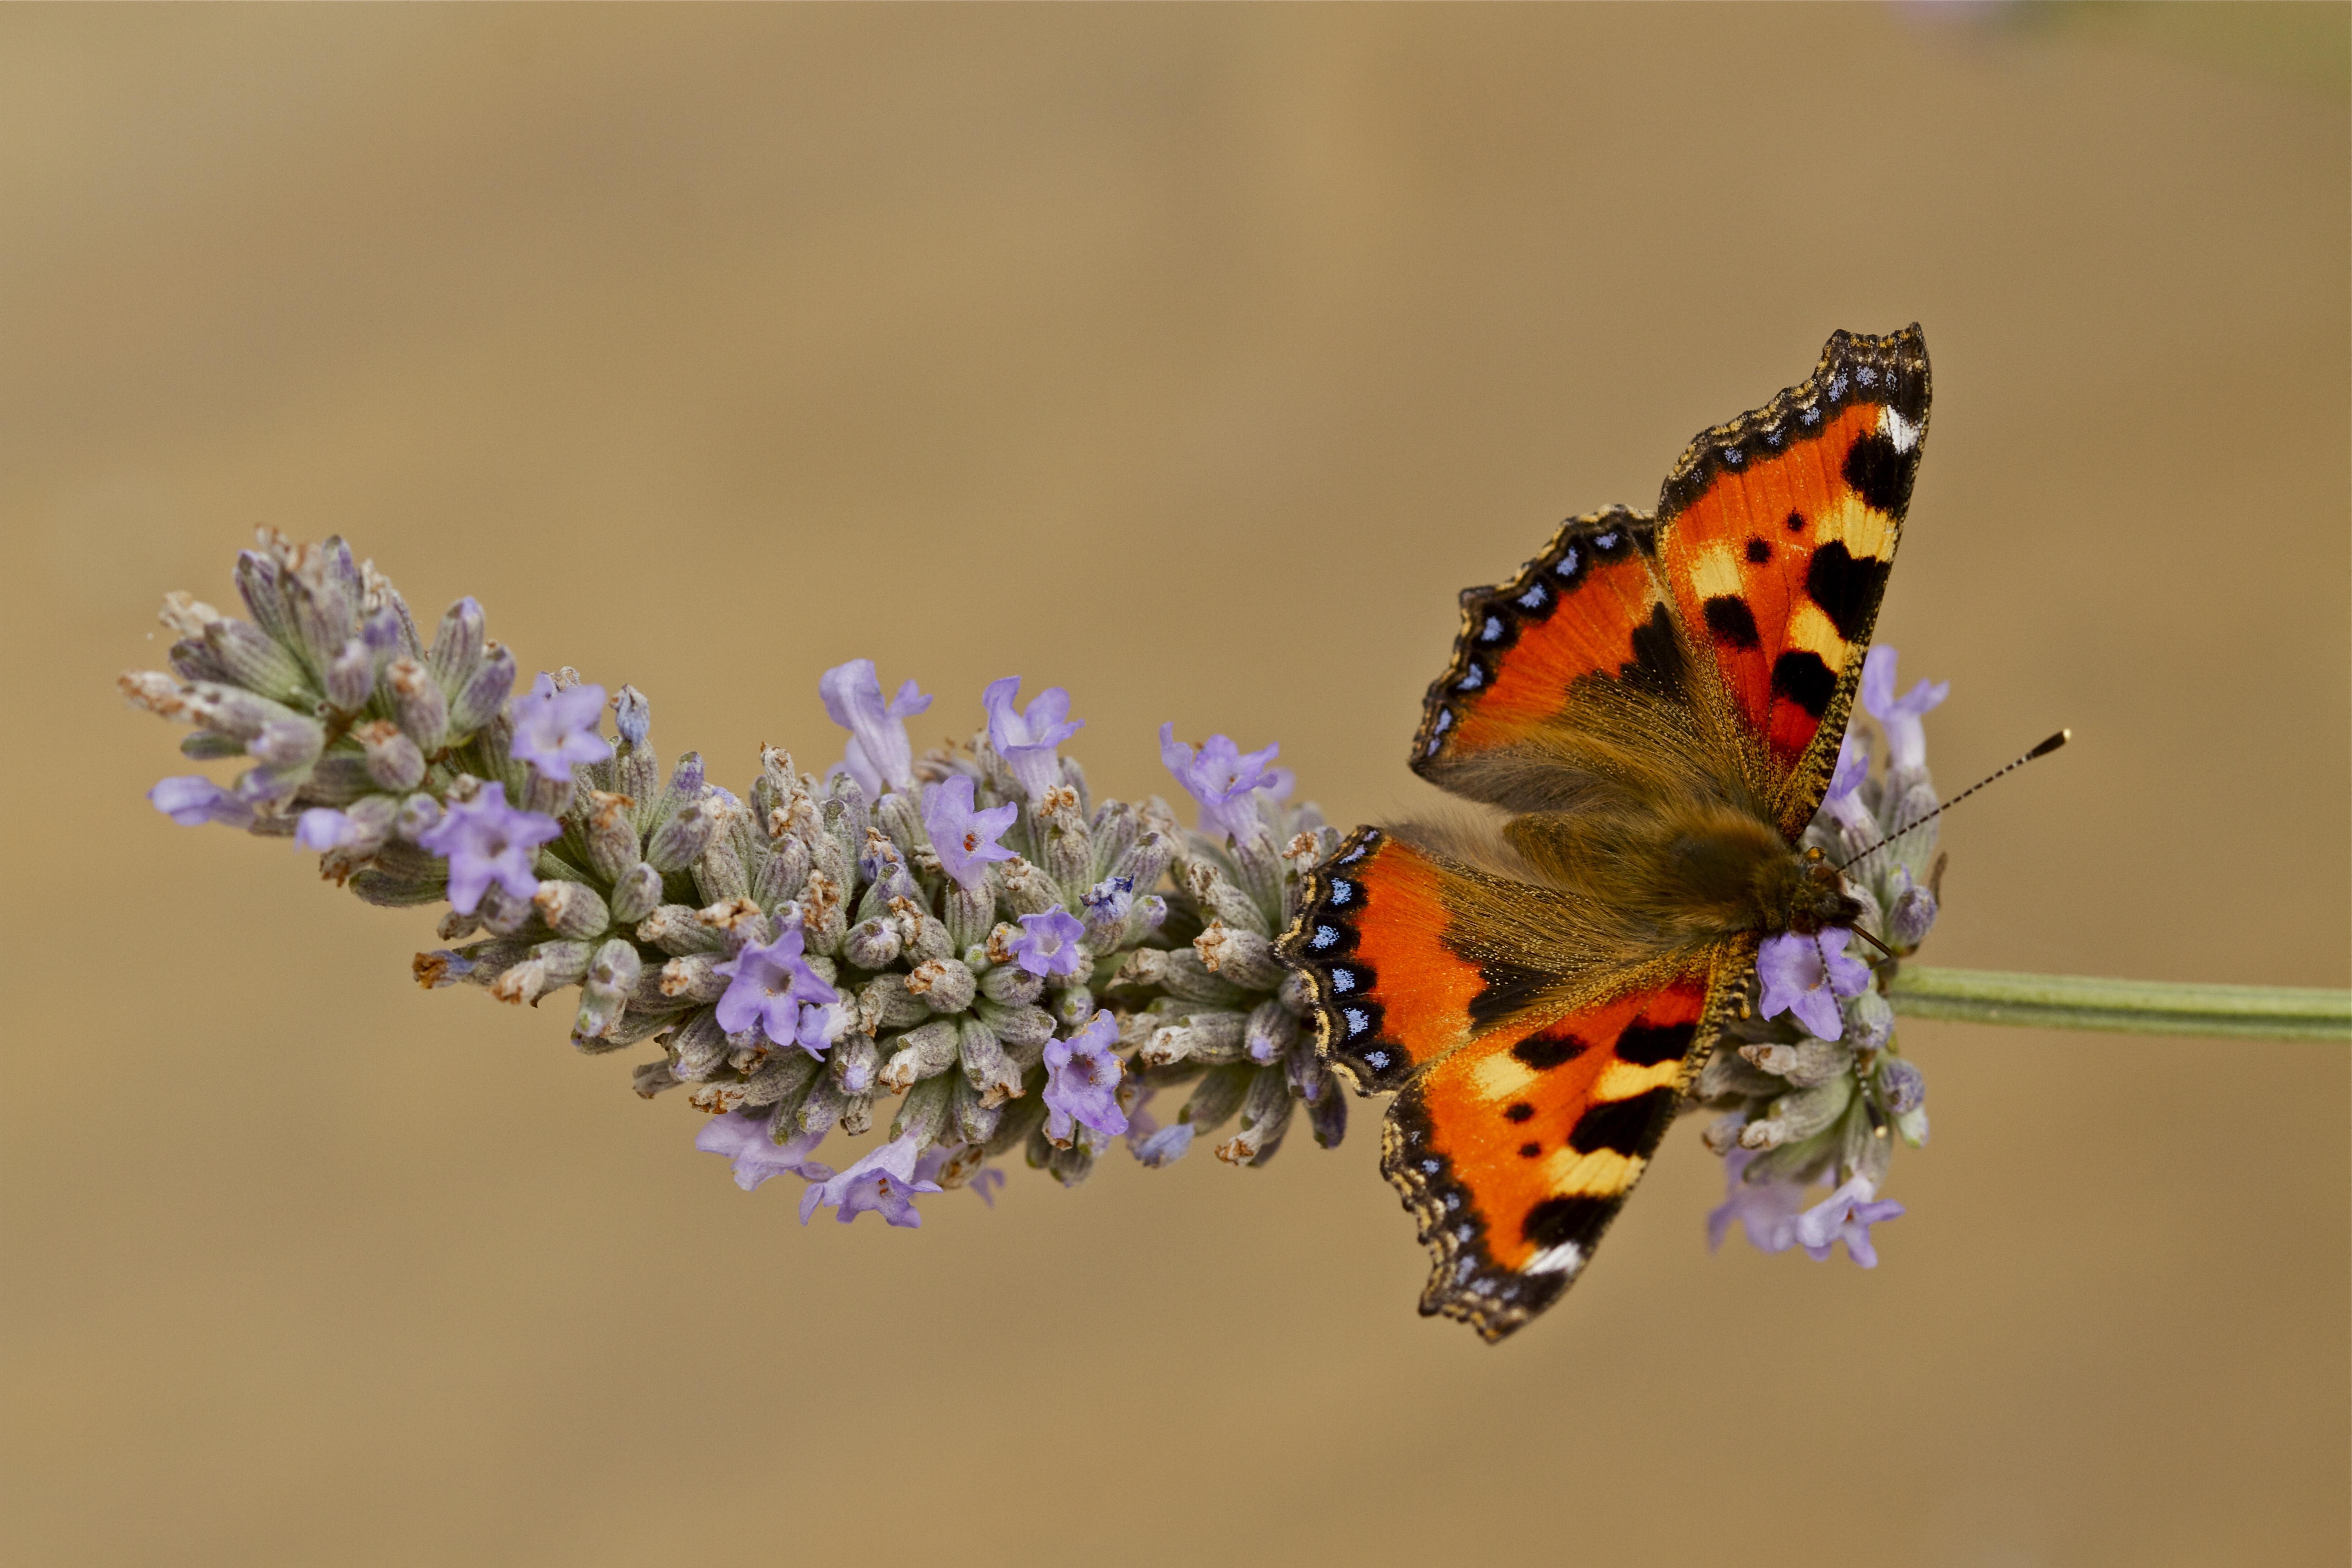 Mariposa color Naranja - 5184x3456